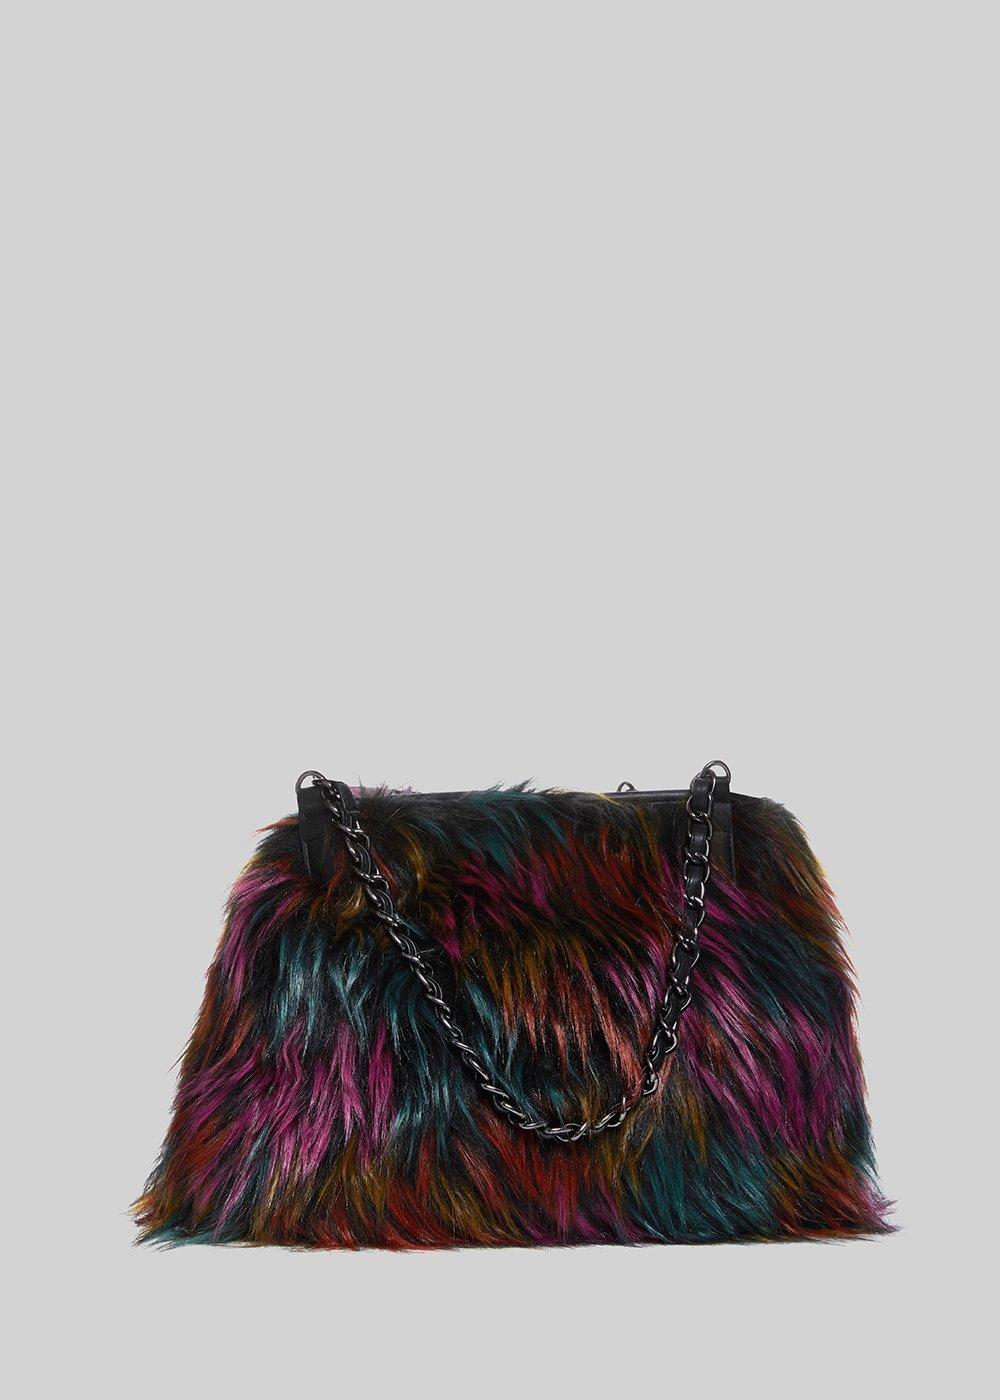 Fake Fur Multicolor Bag Favolosa With Chain Handles  951a1d8c41717